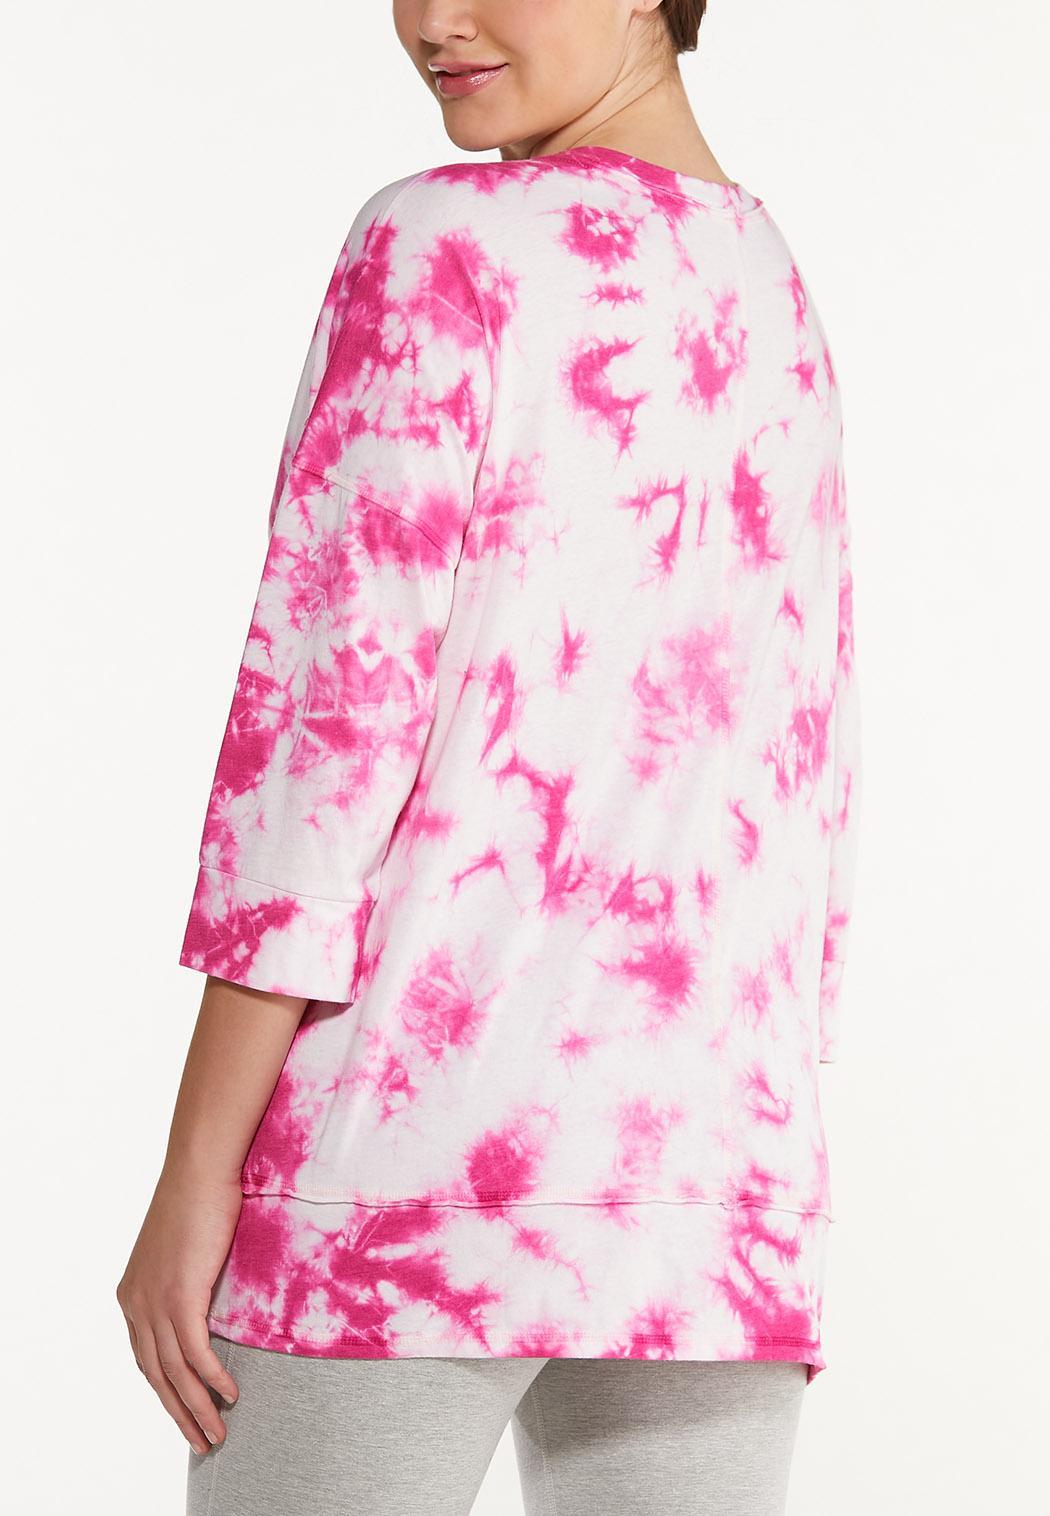 Plus Size Pink Tie Dye Top (Item #44567599)